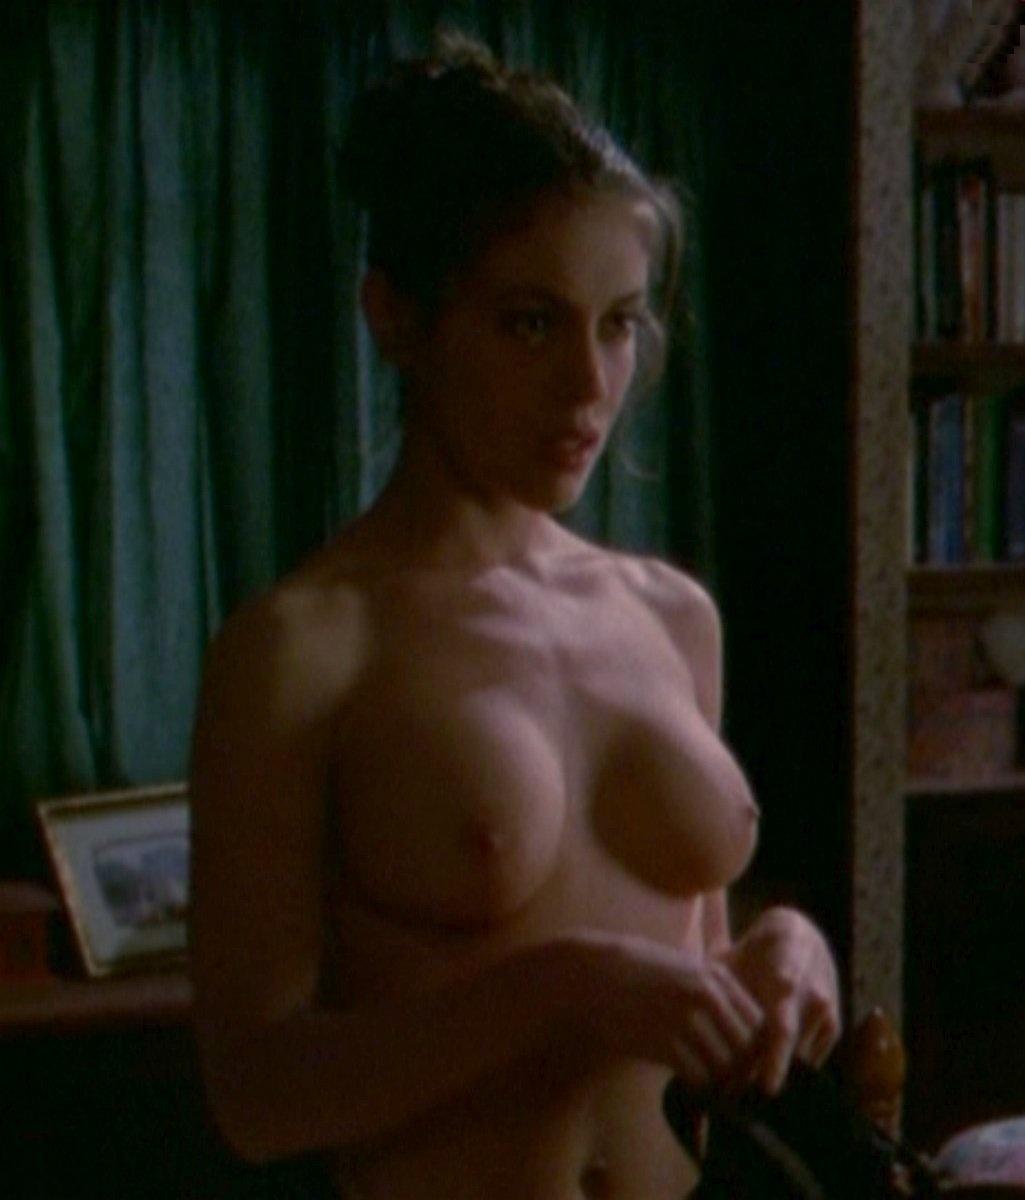 World model alyssa milano nude in film girl hot nude